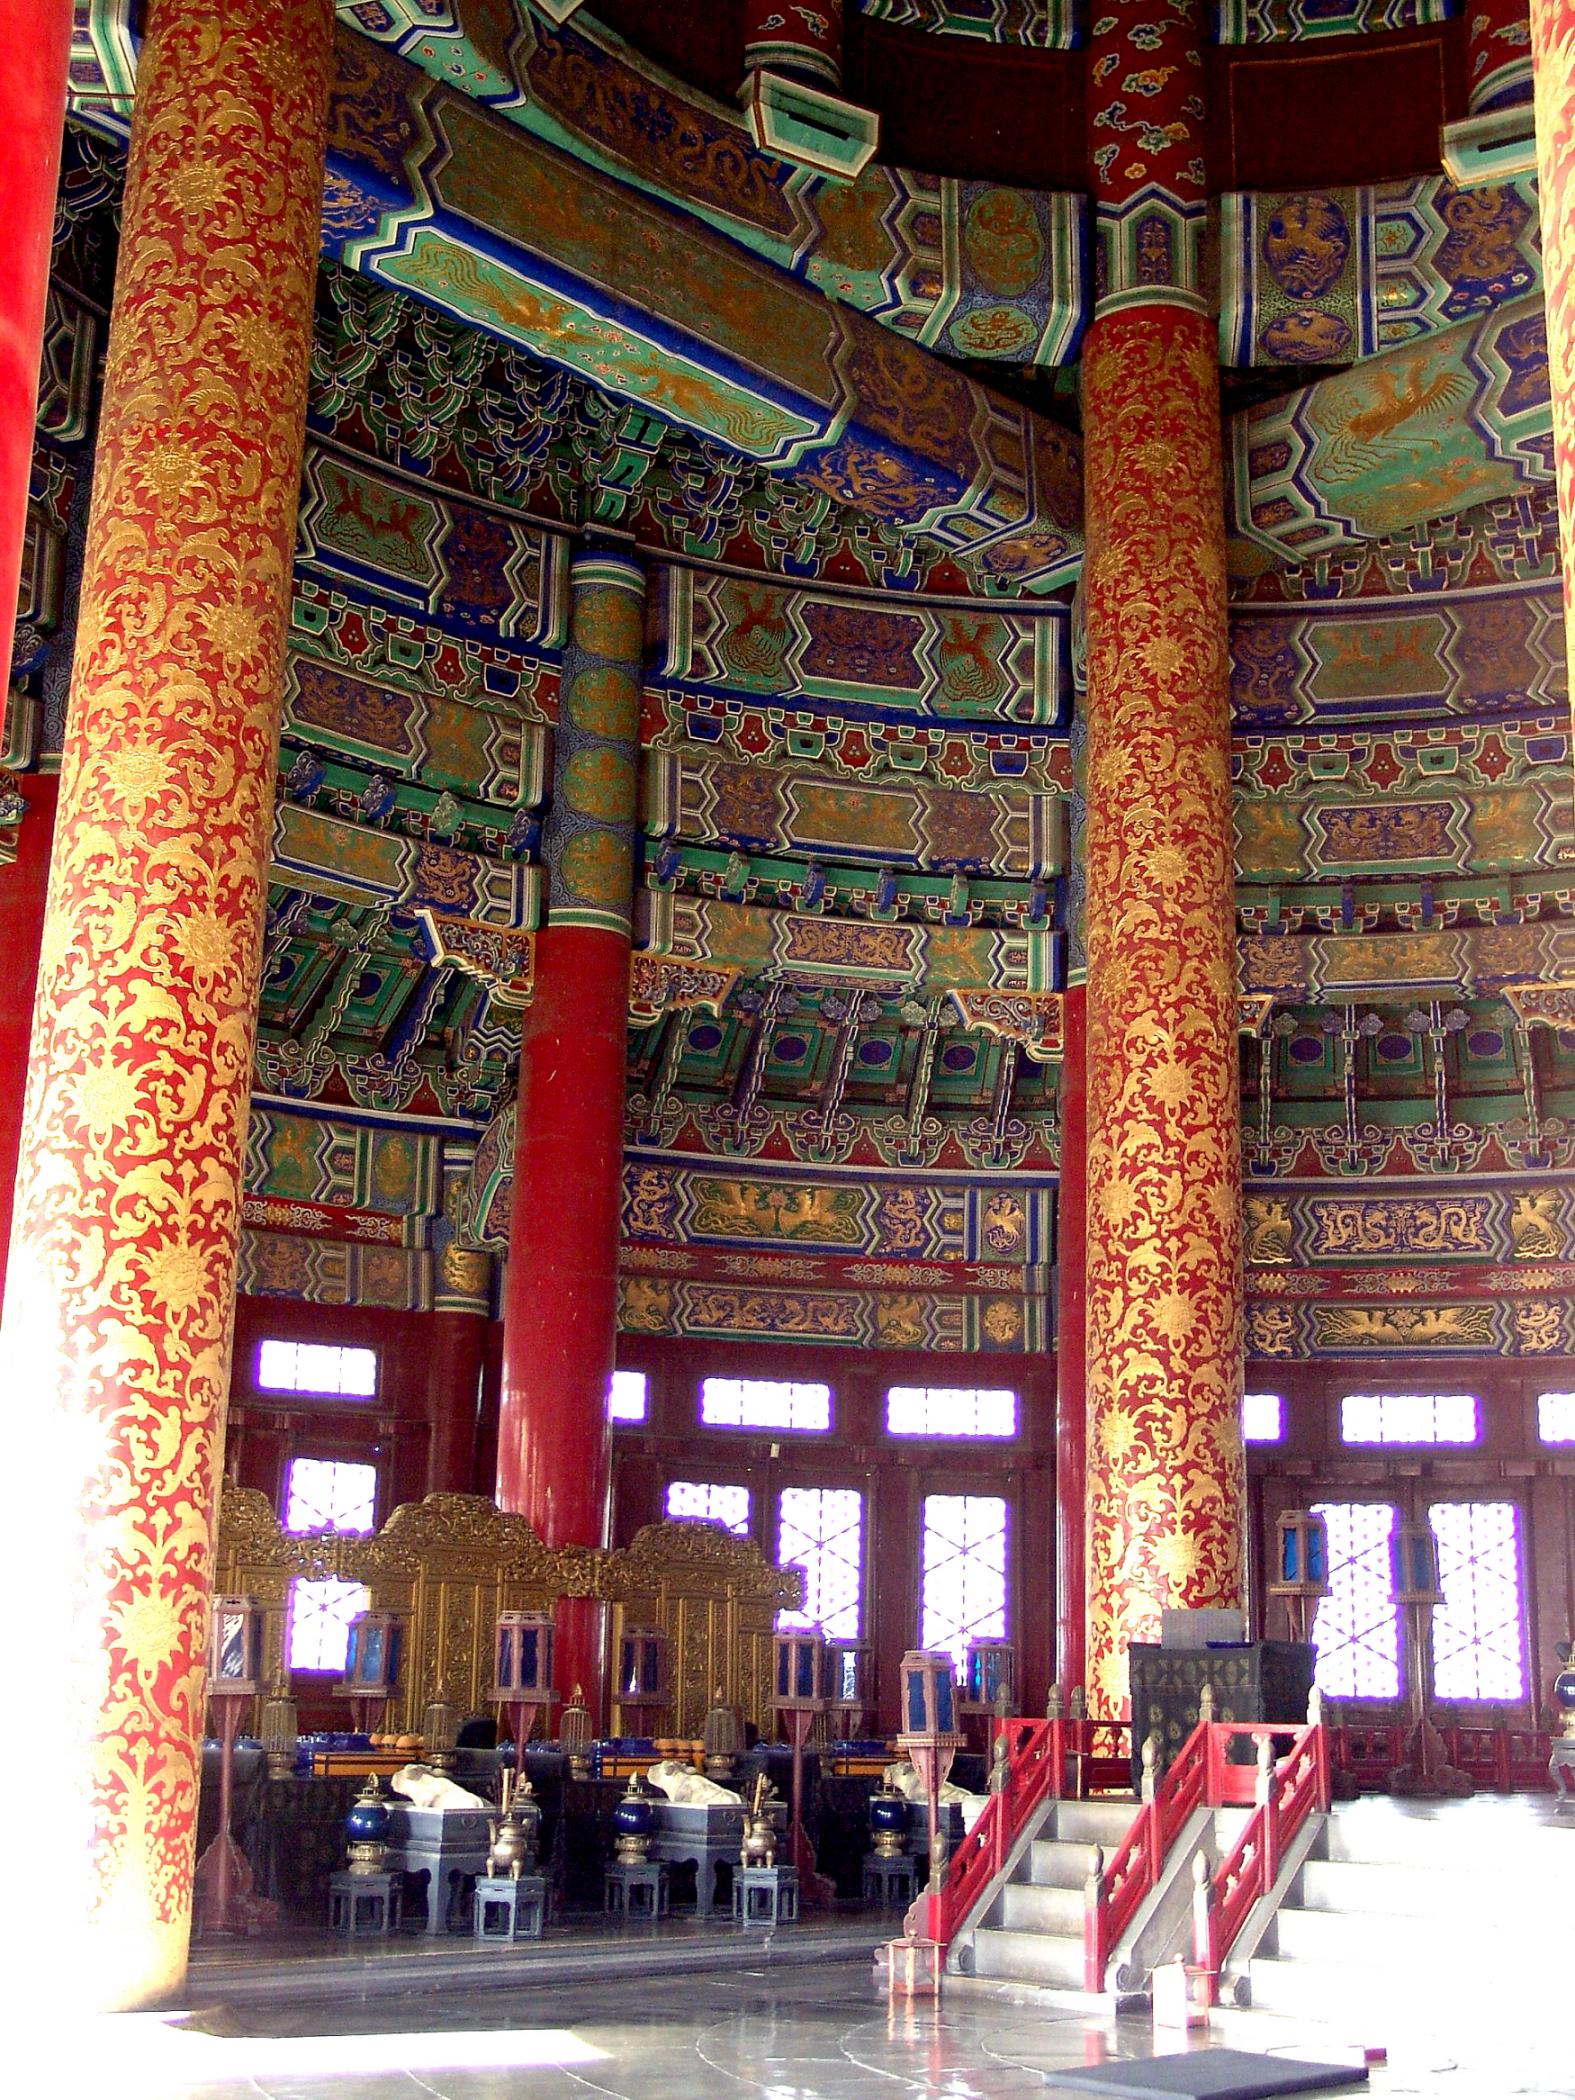 Inside the Hall of Prayer for Good Harvests.